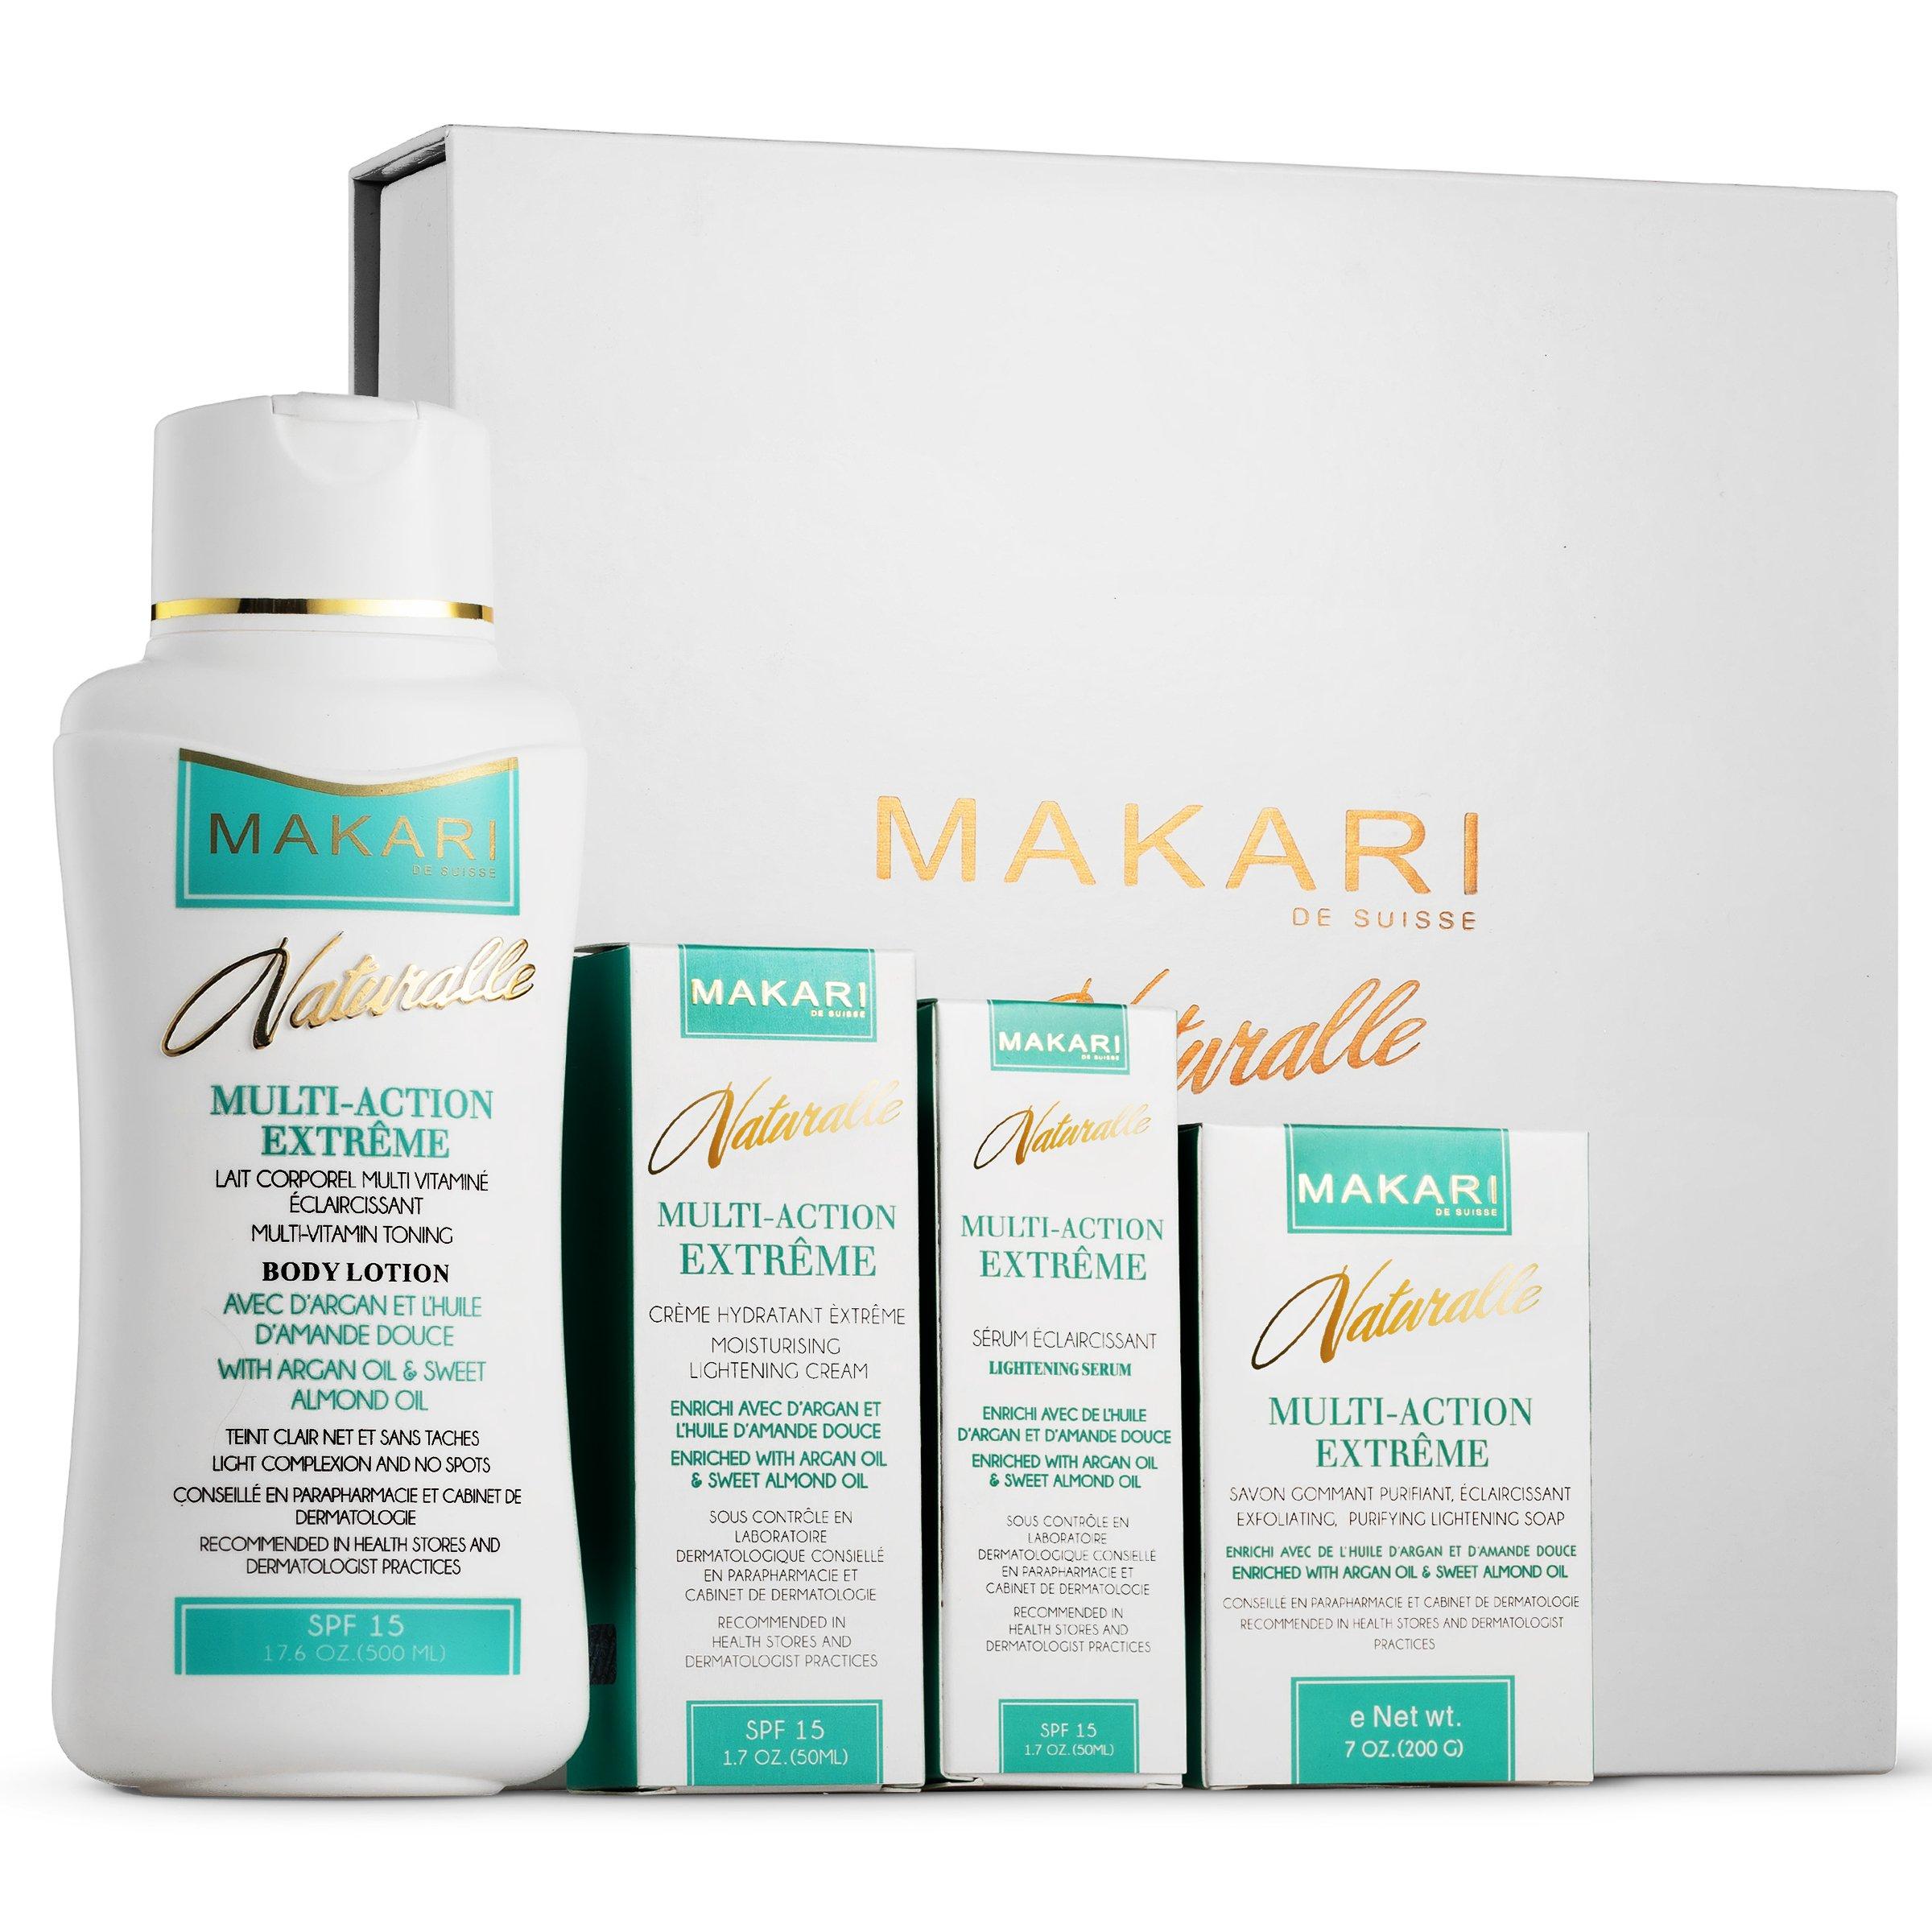 Makari Naturalle Multi-Action Extreme Gift Set – Whitening & Moisturizing with Argan Oil & SPF 15 – Hydrating & Regulating Treatment for Dark Spots, Acne,